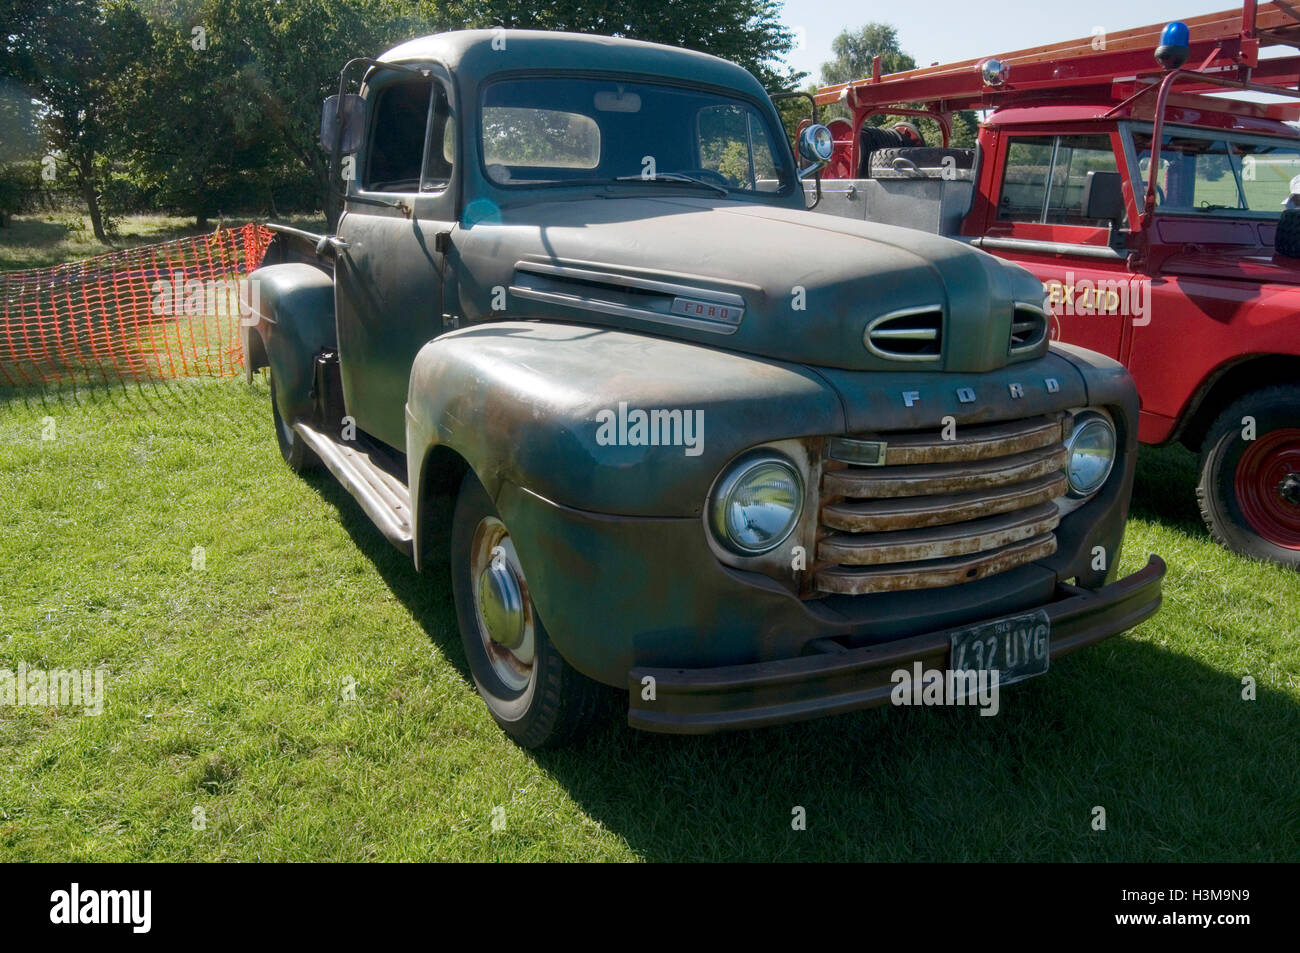 Classic Pickups Stock Photos & Classic Pickups Stock Images - Alamy